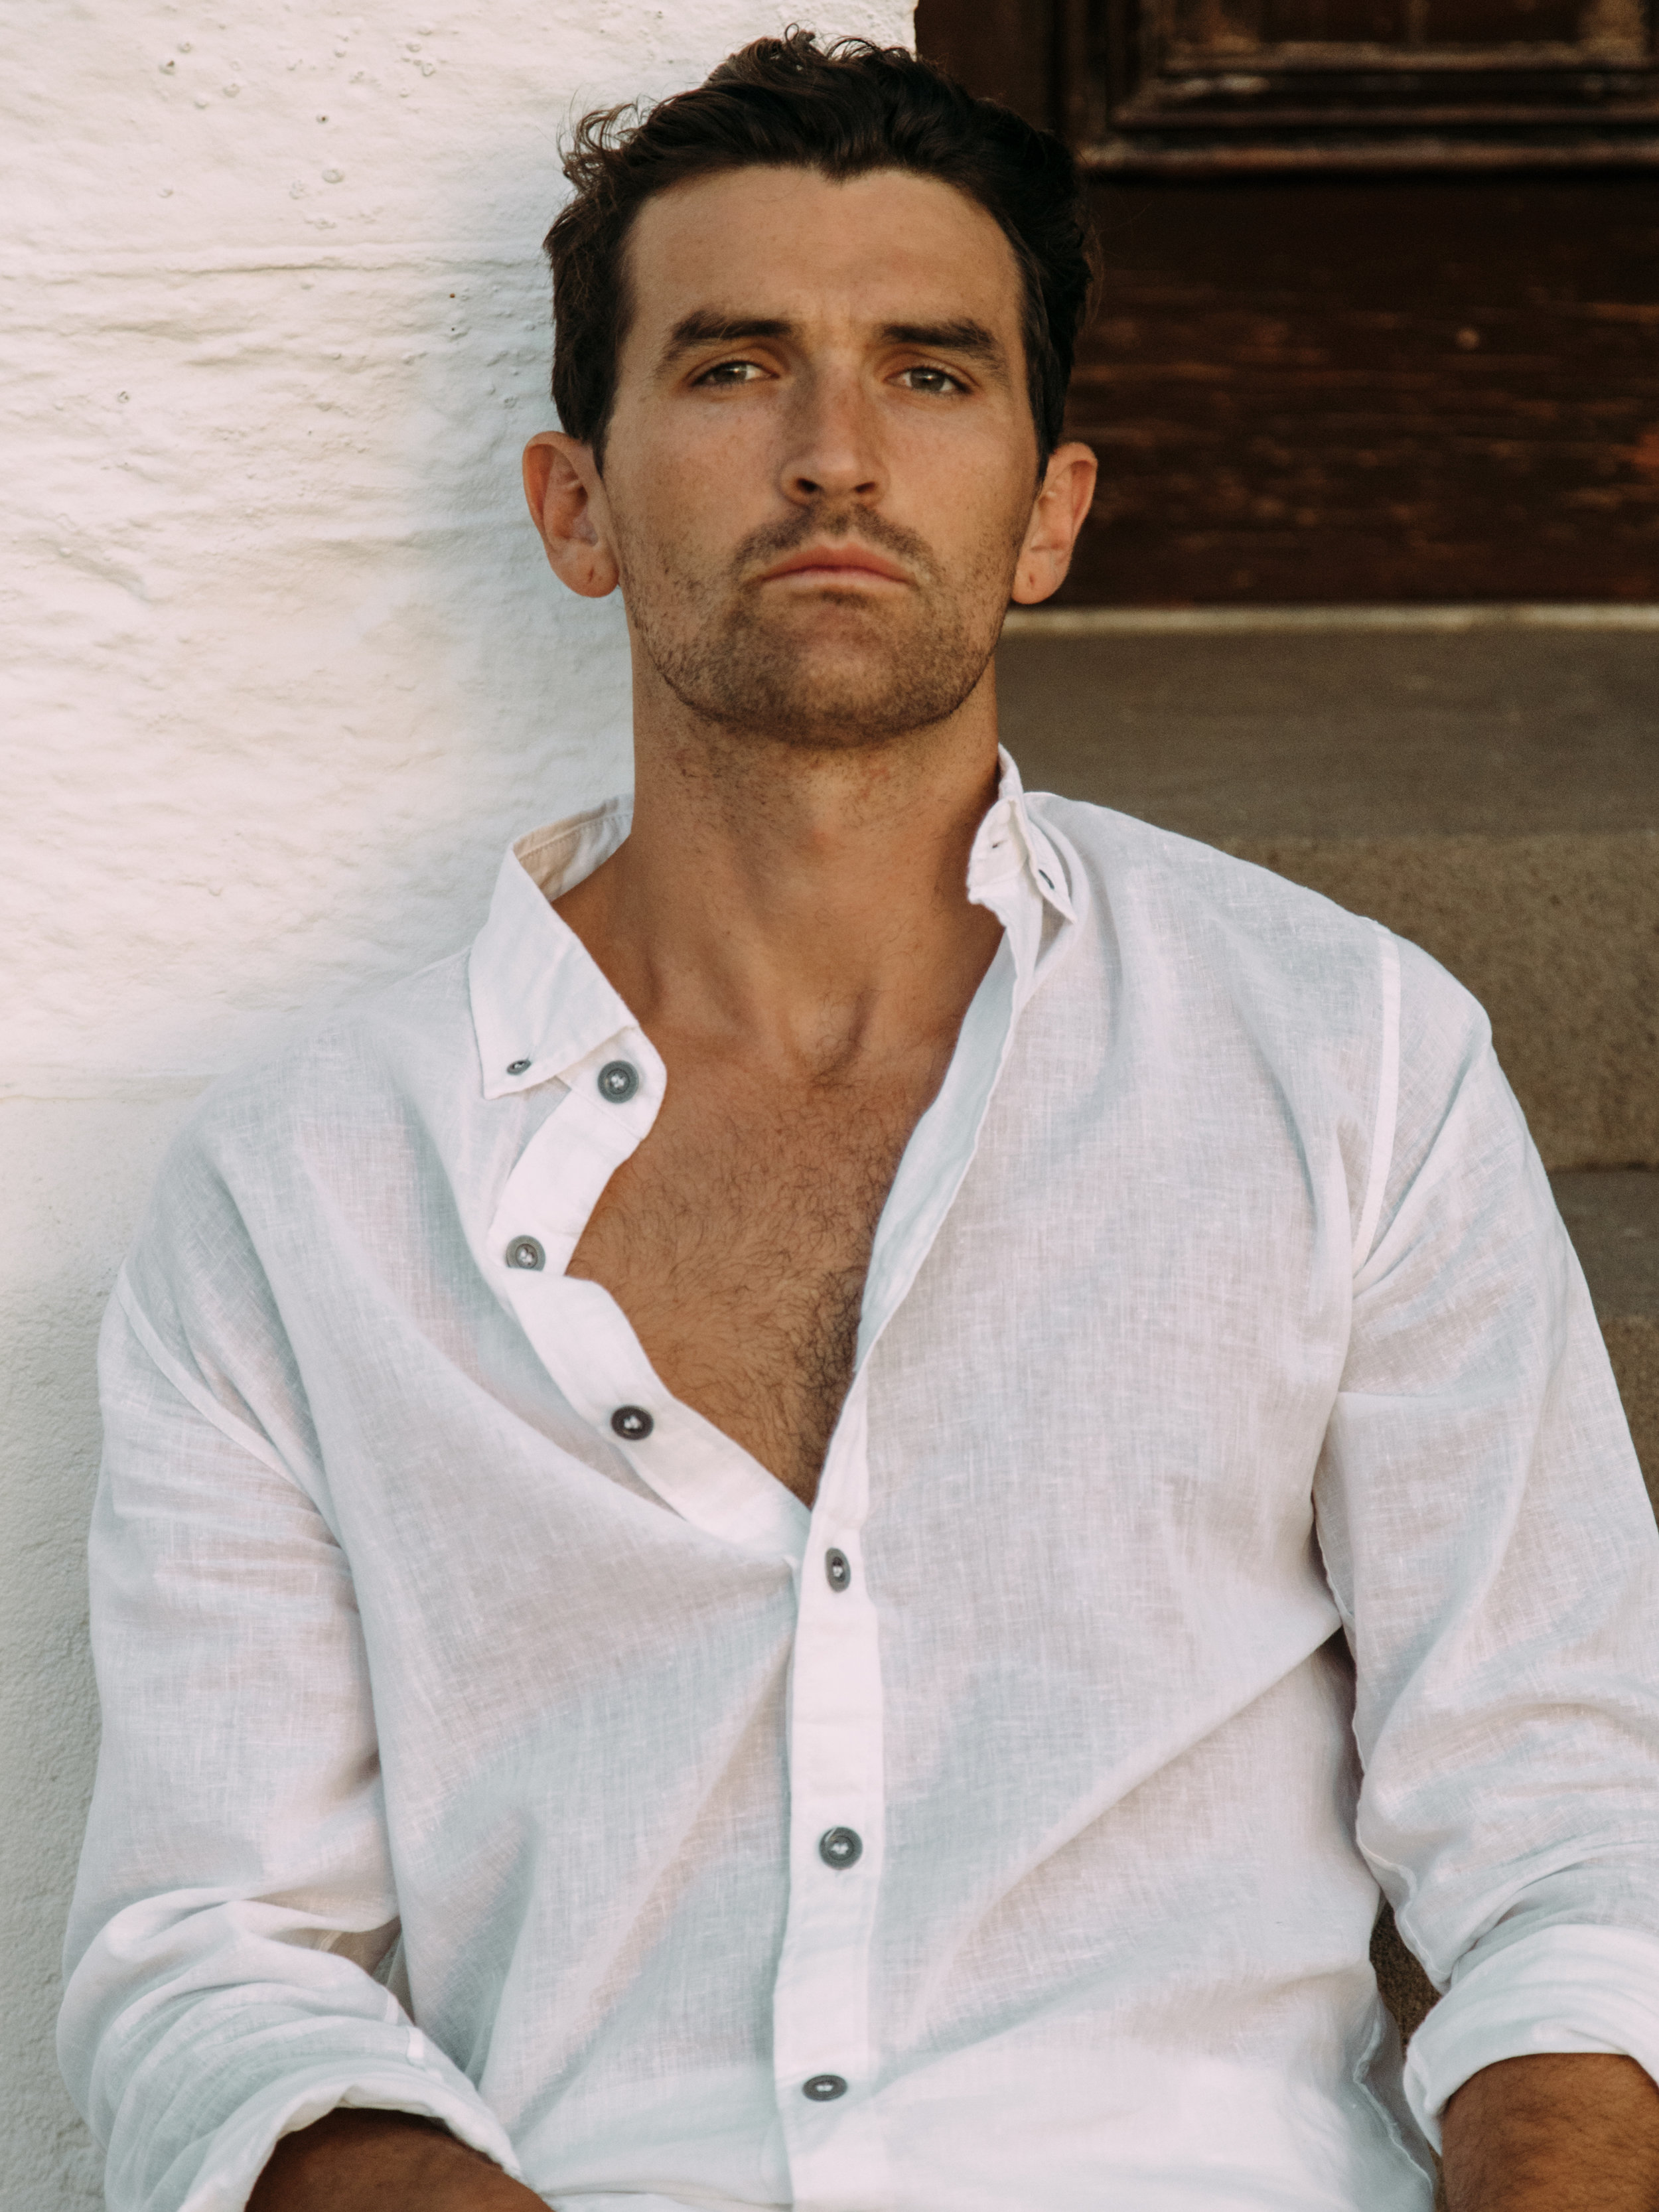 Shane Benson